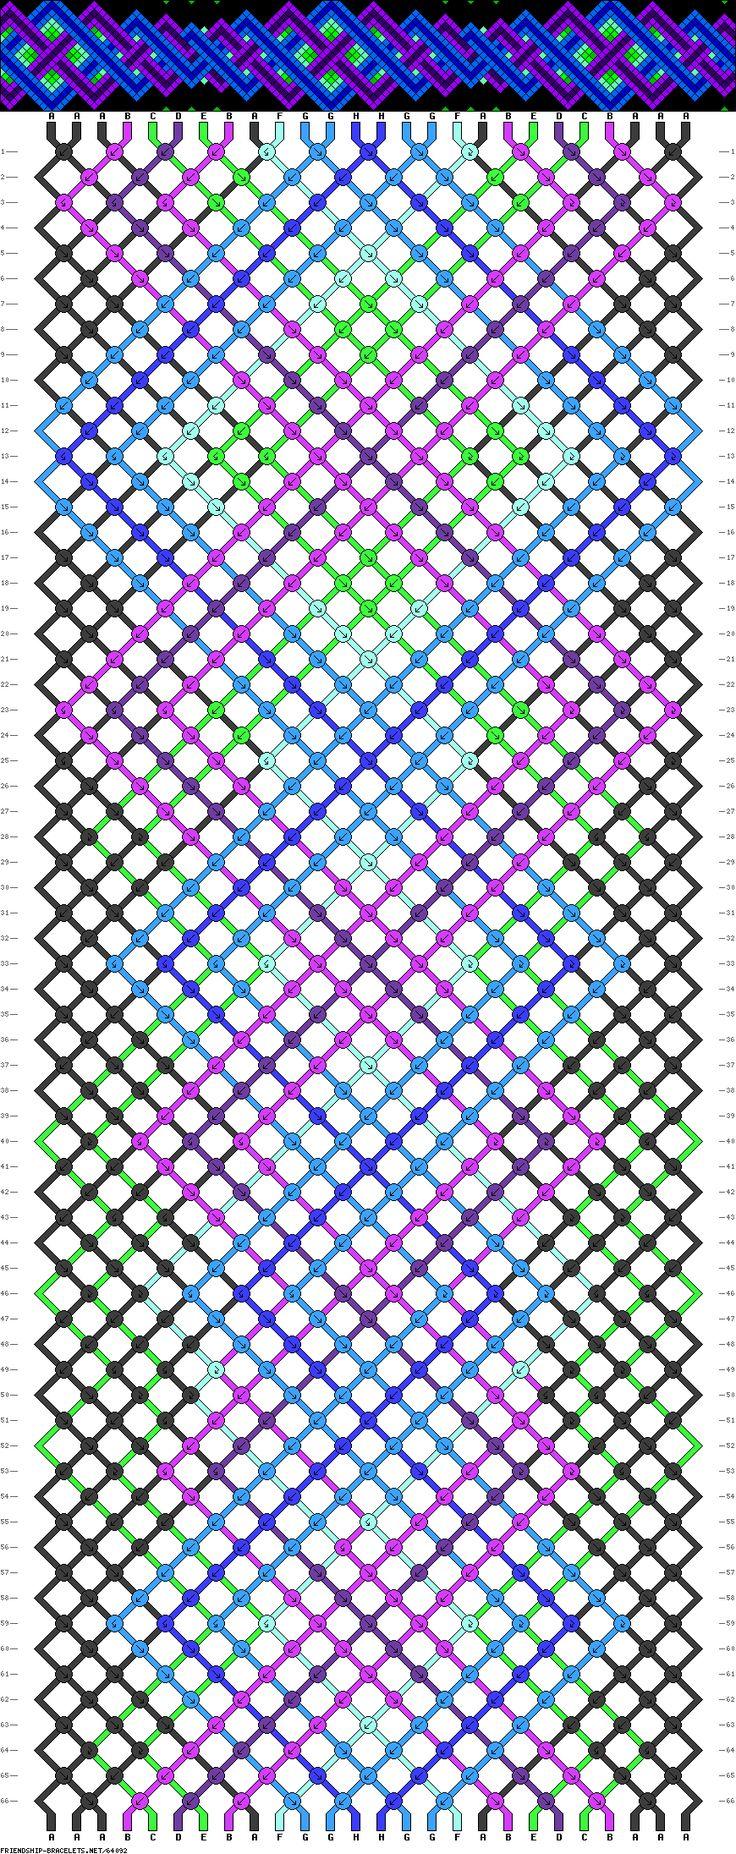 26 Strings, 66 Rows, 8 Colors · Friendship Bracelet